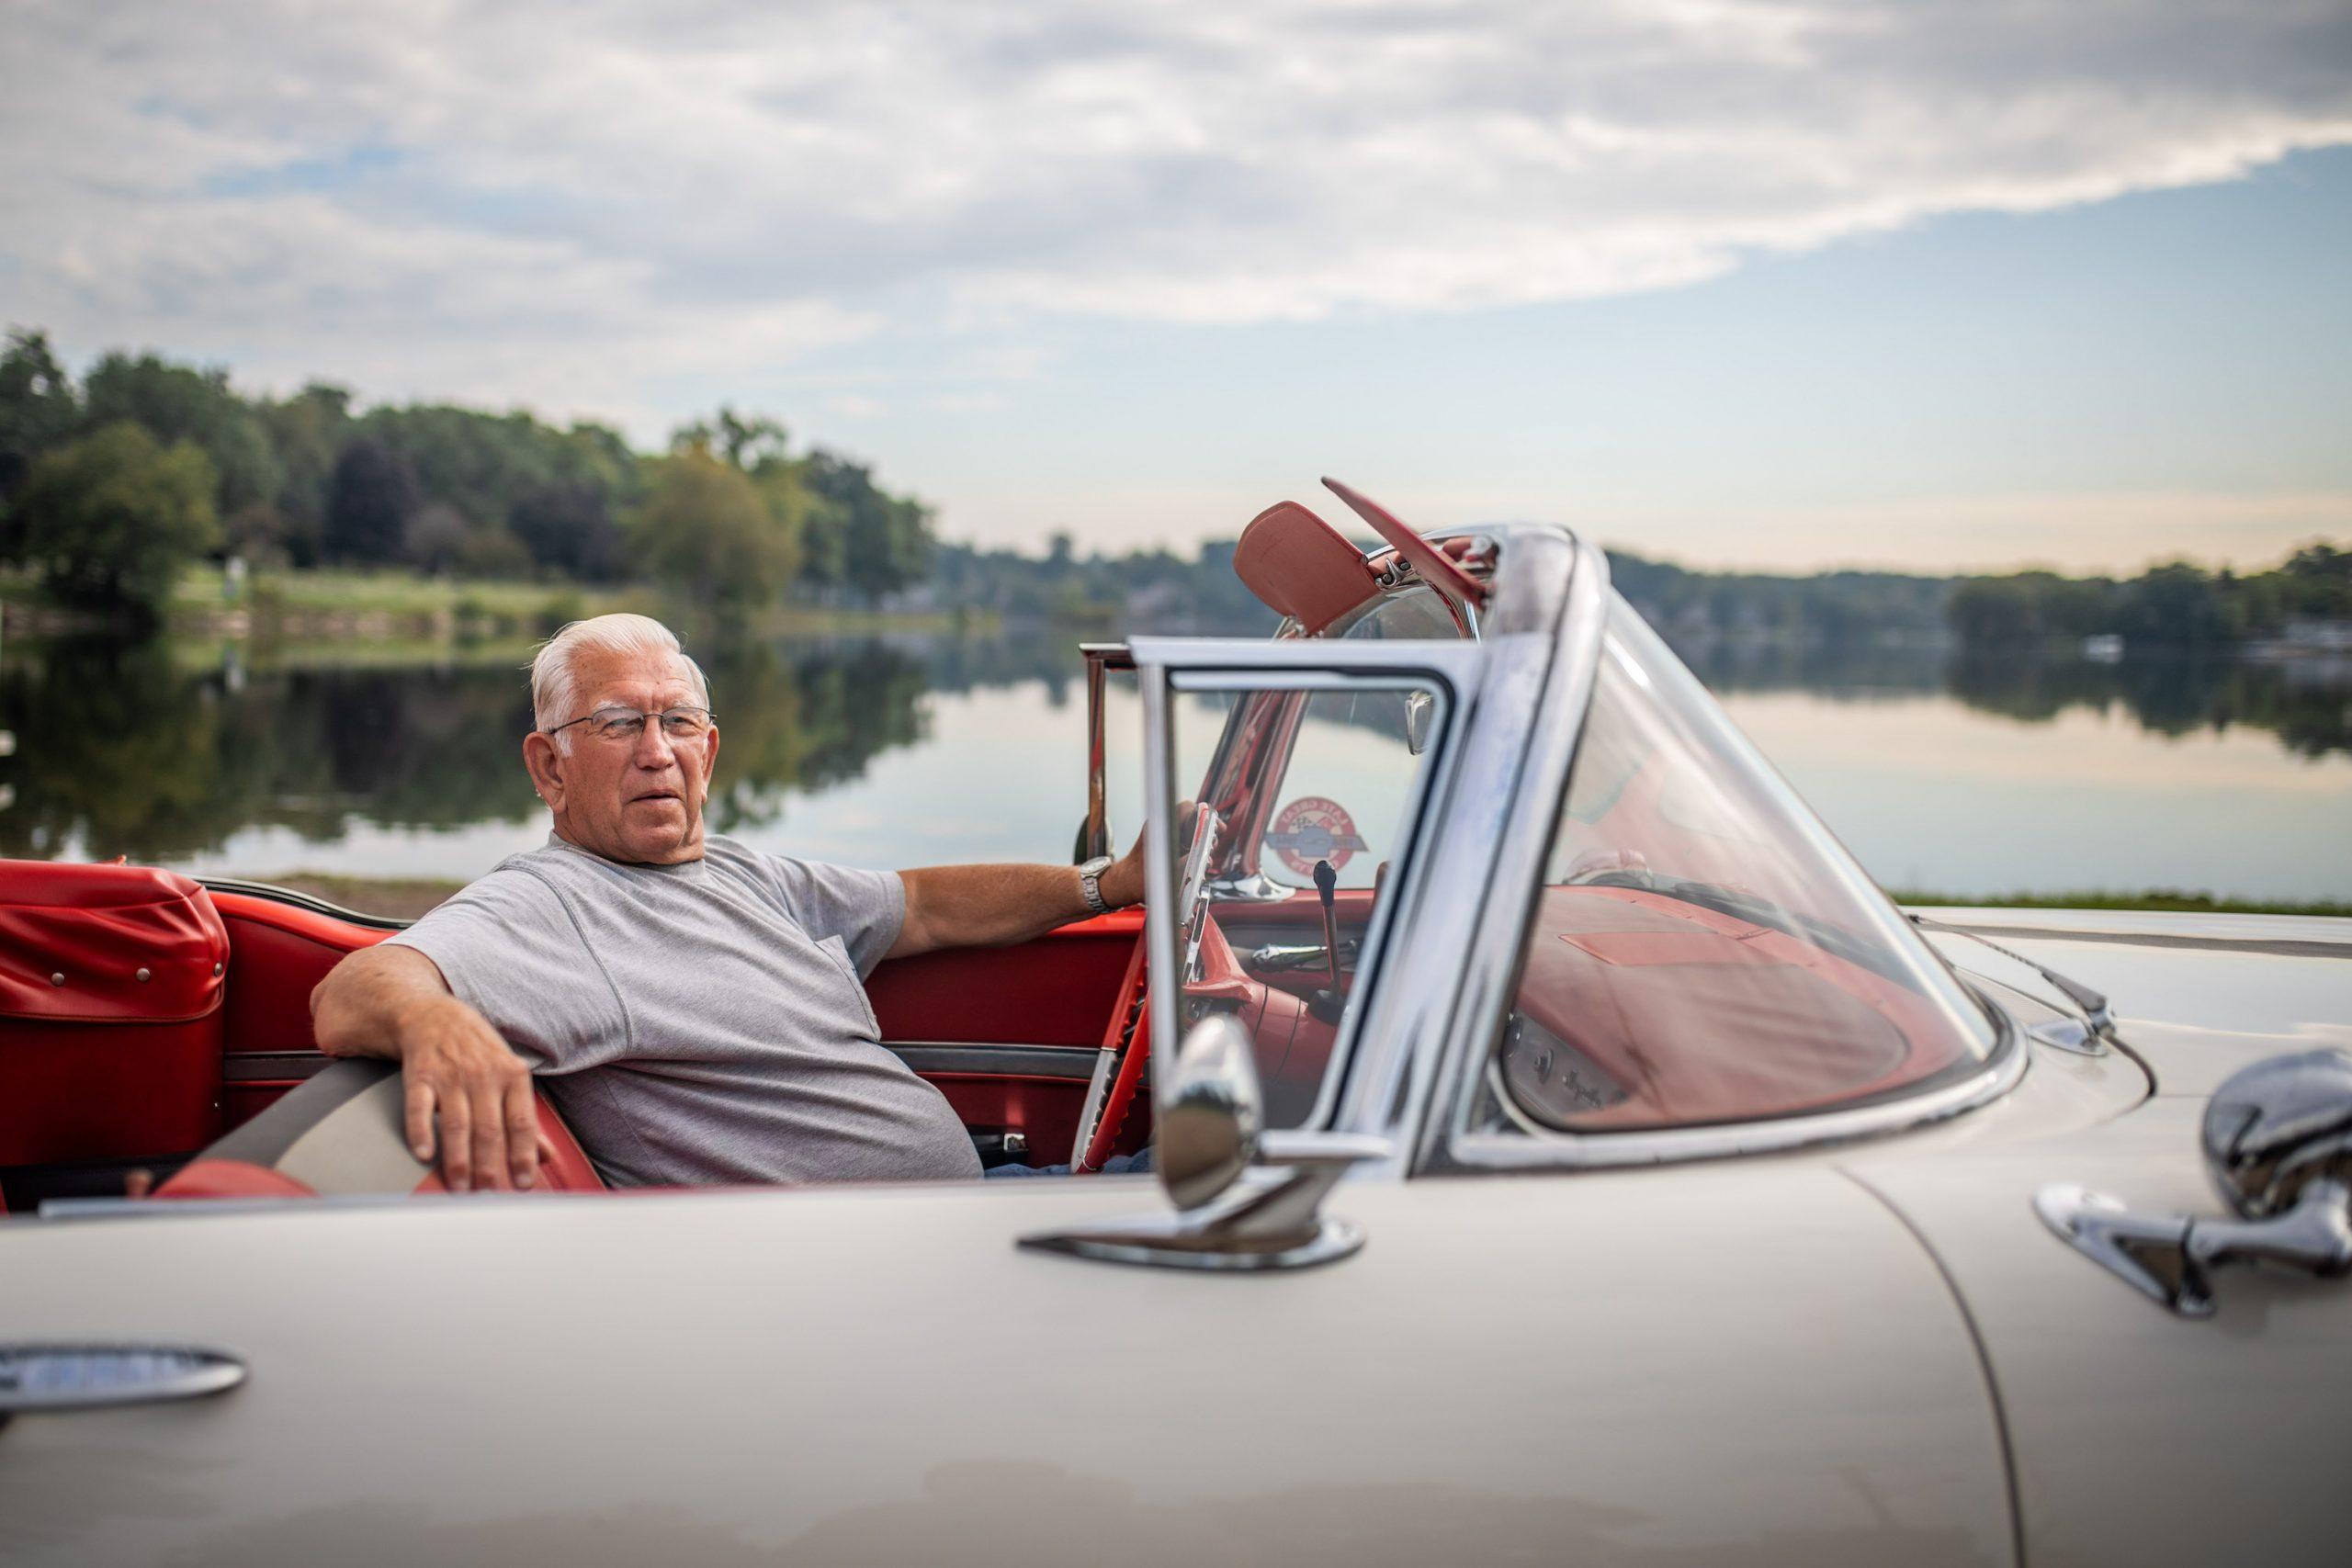 1958 Chevrolet Impala Convertible Owner Behind Wheel